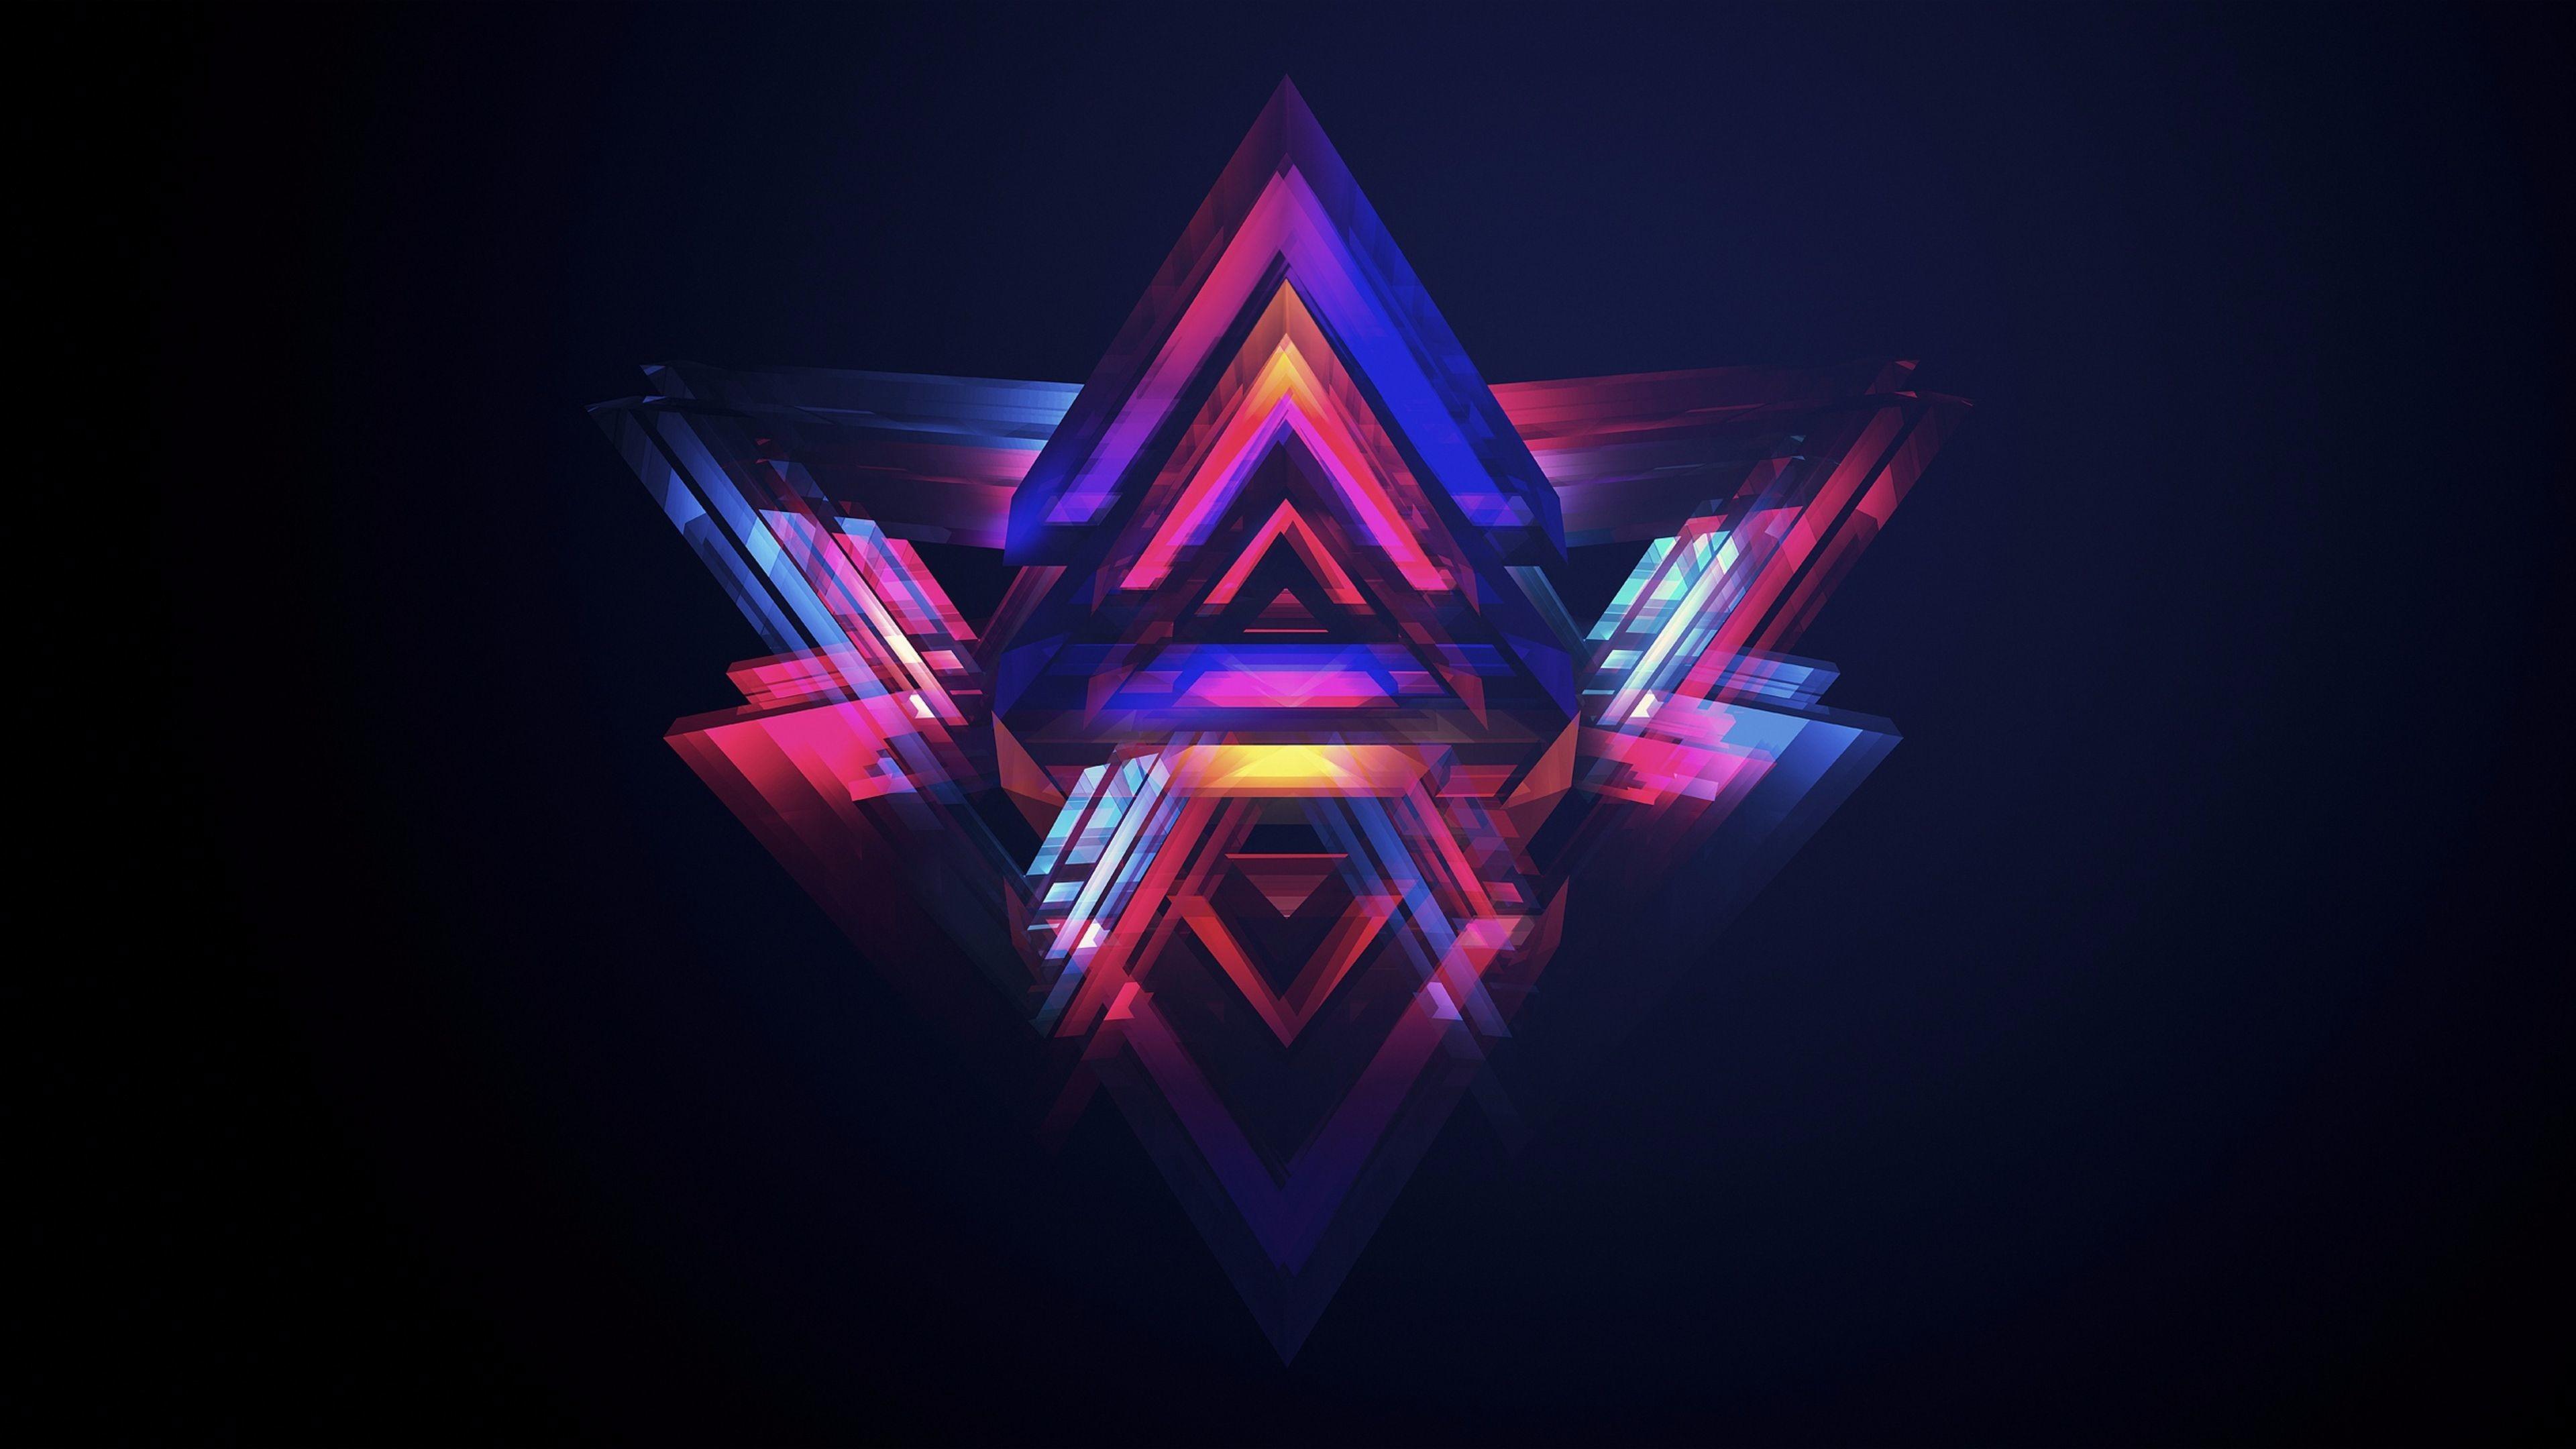 Colorful-Pyramid-Abstract-4K-Wallpaper.jpg (3840×2160) | Epic Wallpapers |  Pinterest | Wallpaper and Artwork